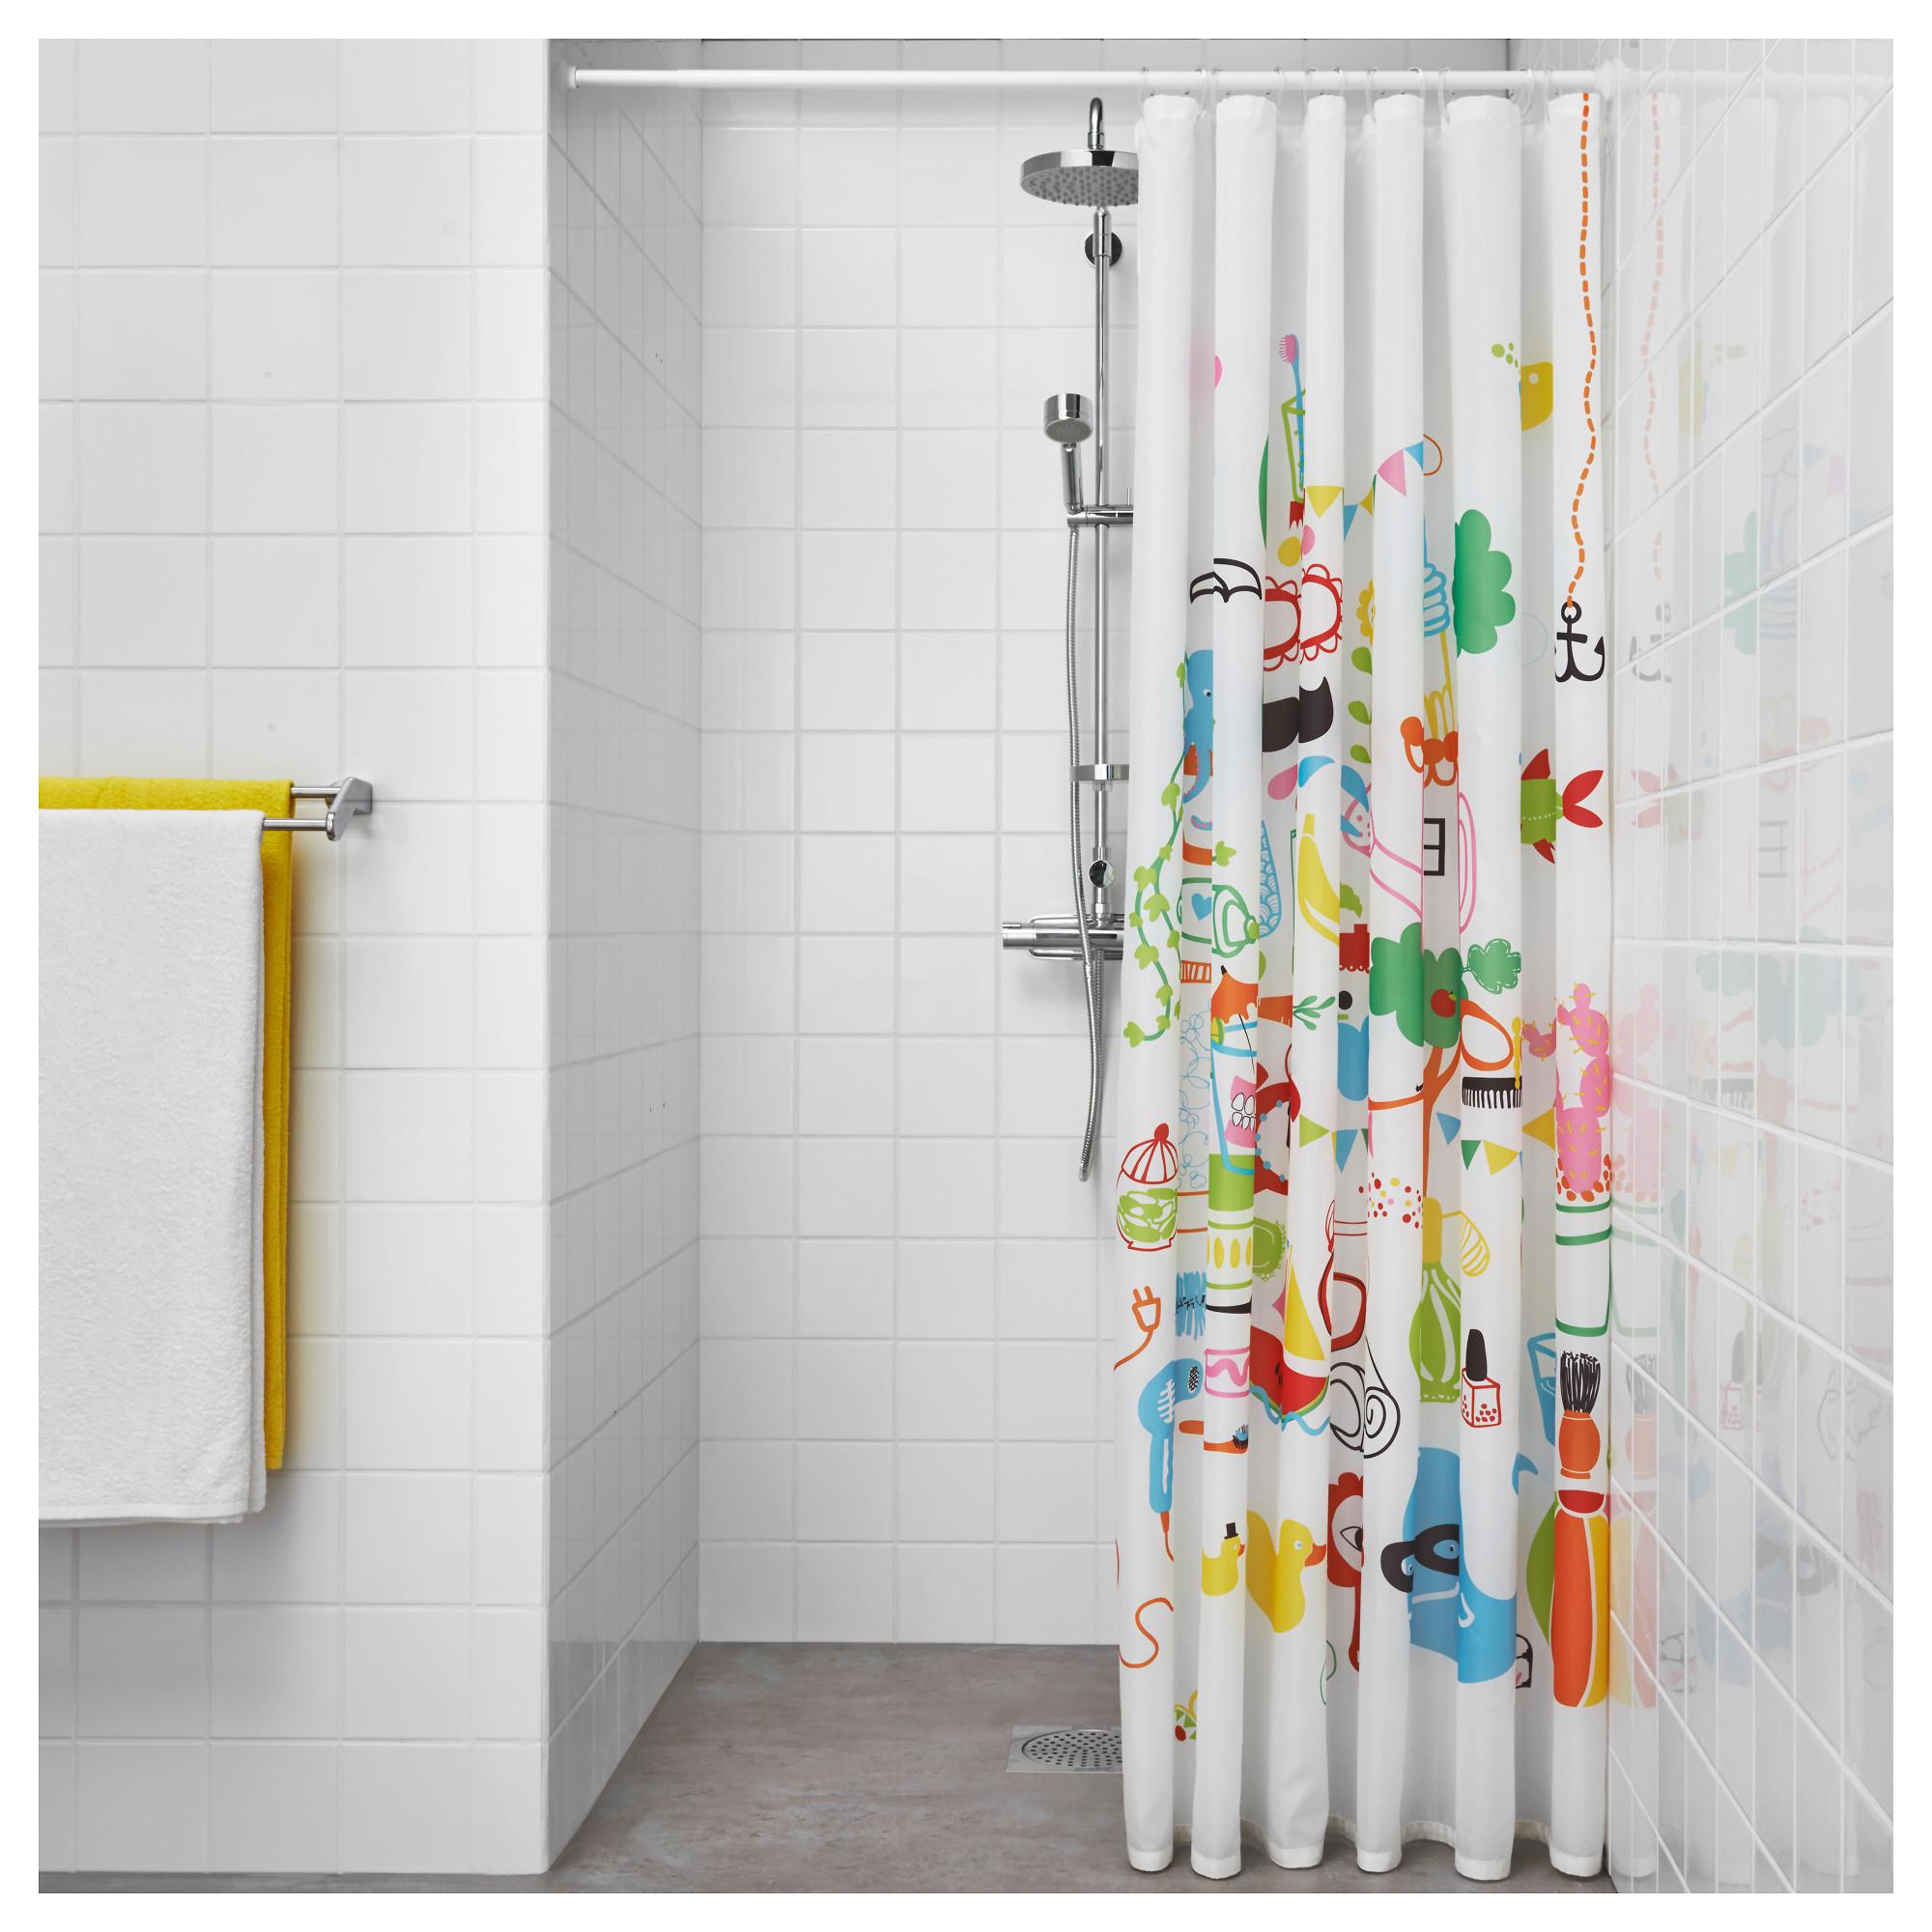 Botaren Shower Curtain Rod White Ikea Hong Kong